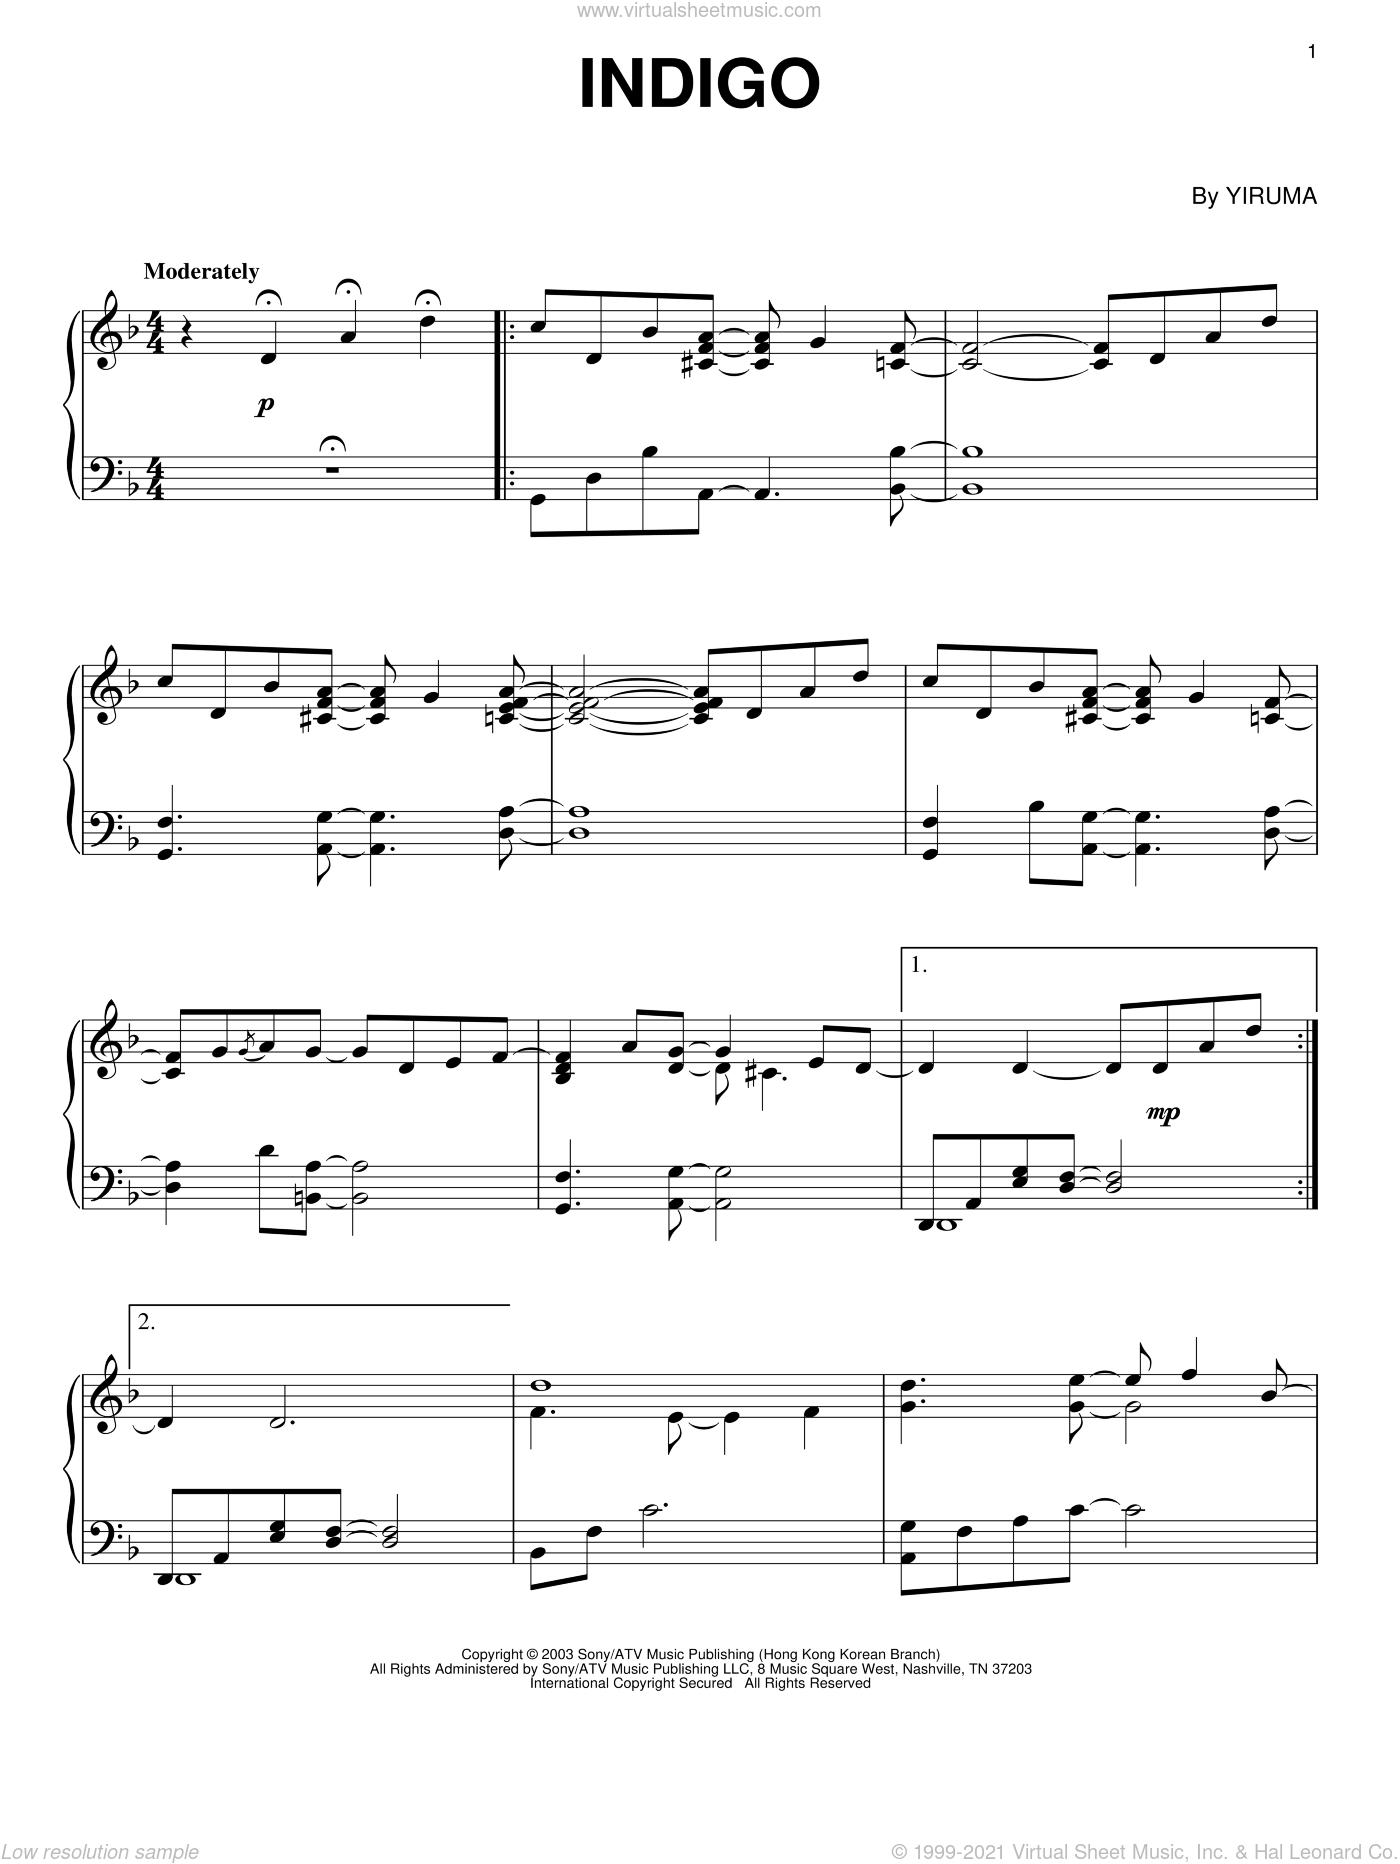 Indigo sheet music for piano solo by Yiruma, classical score, intermediate skill level